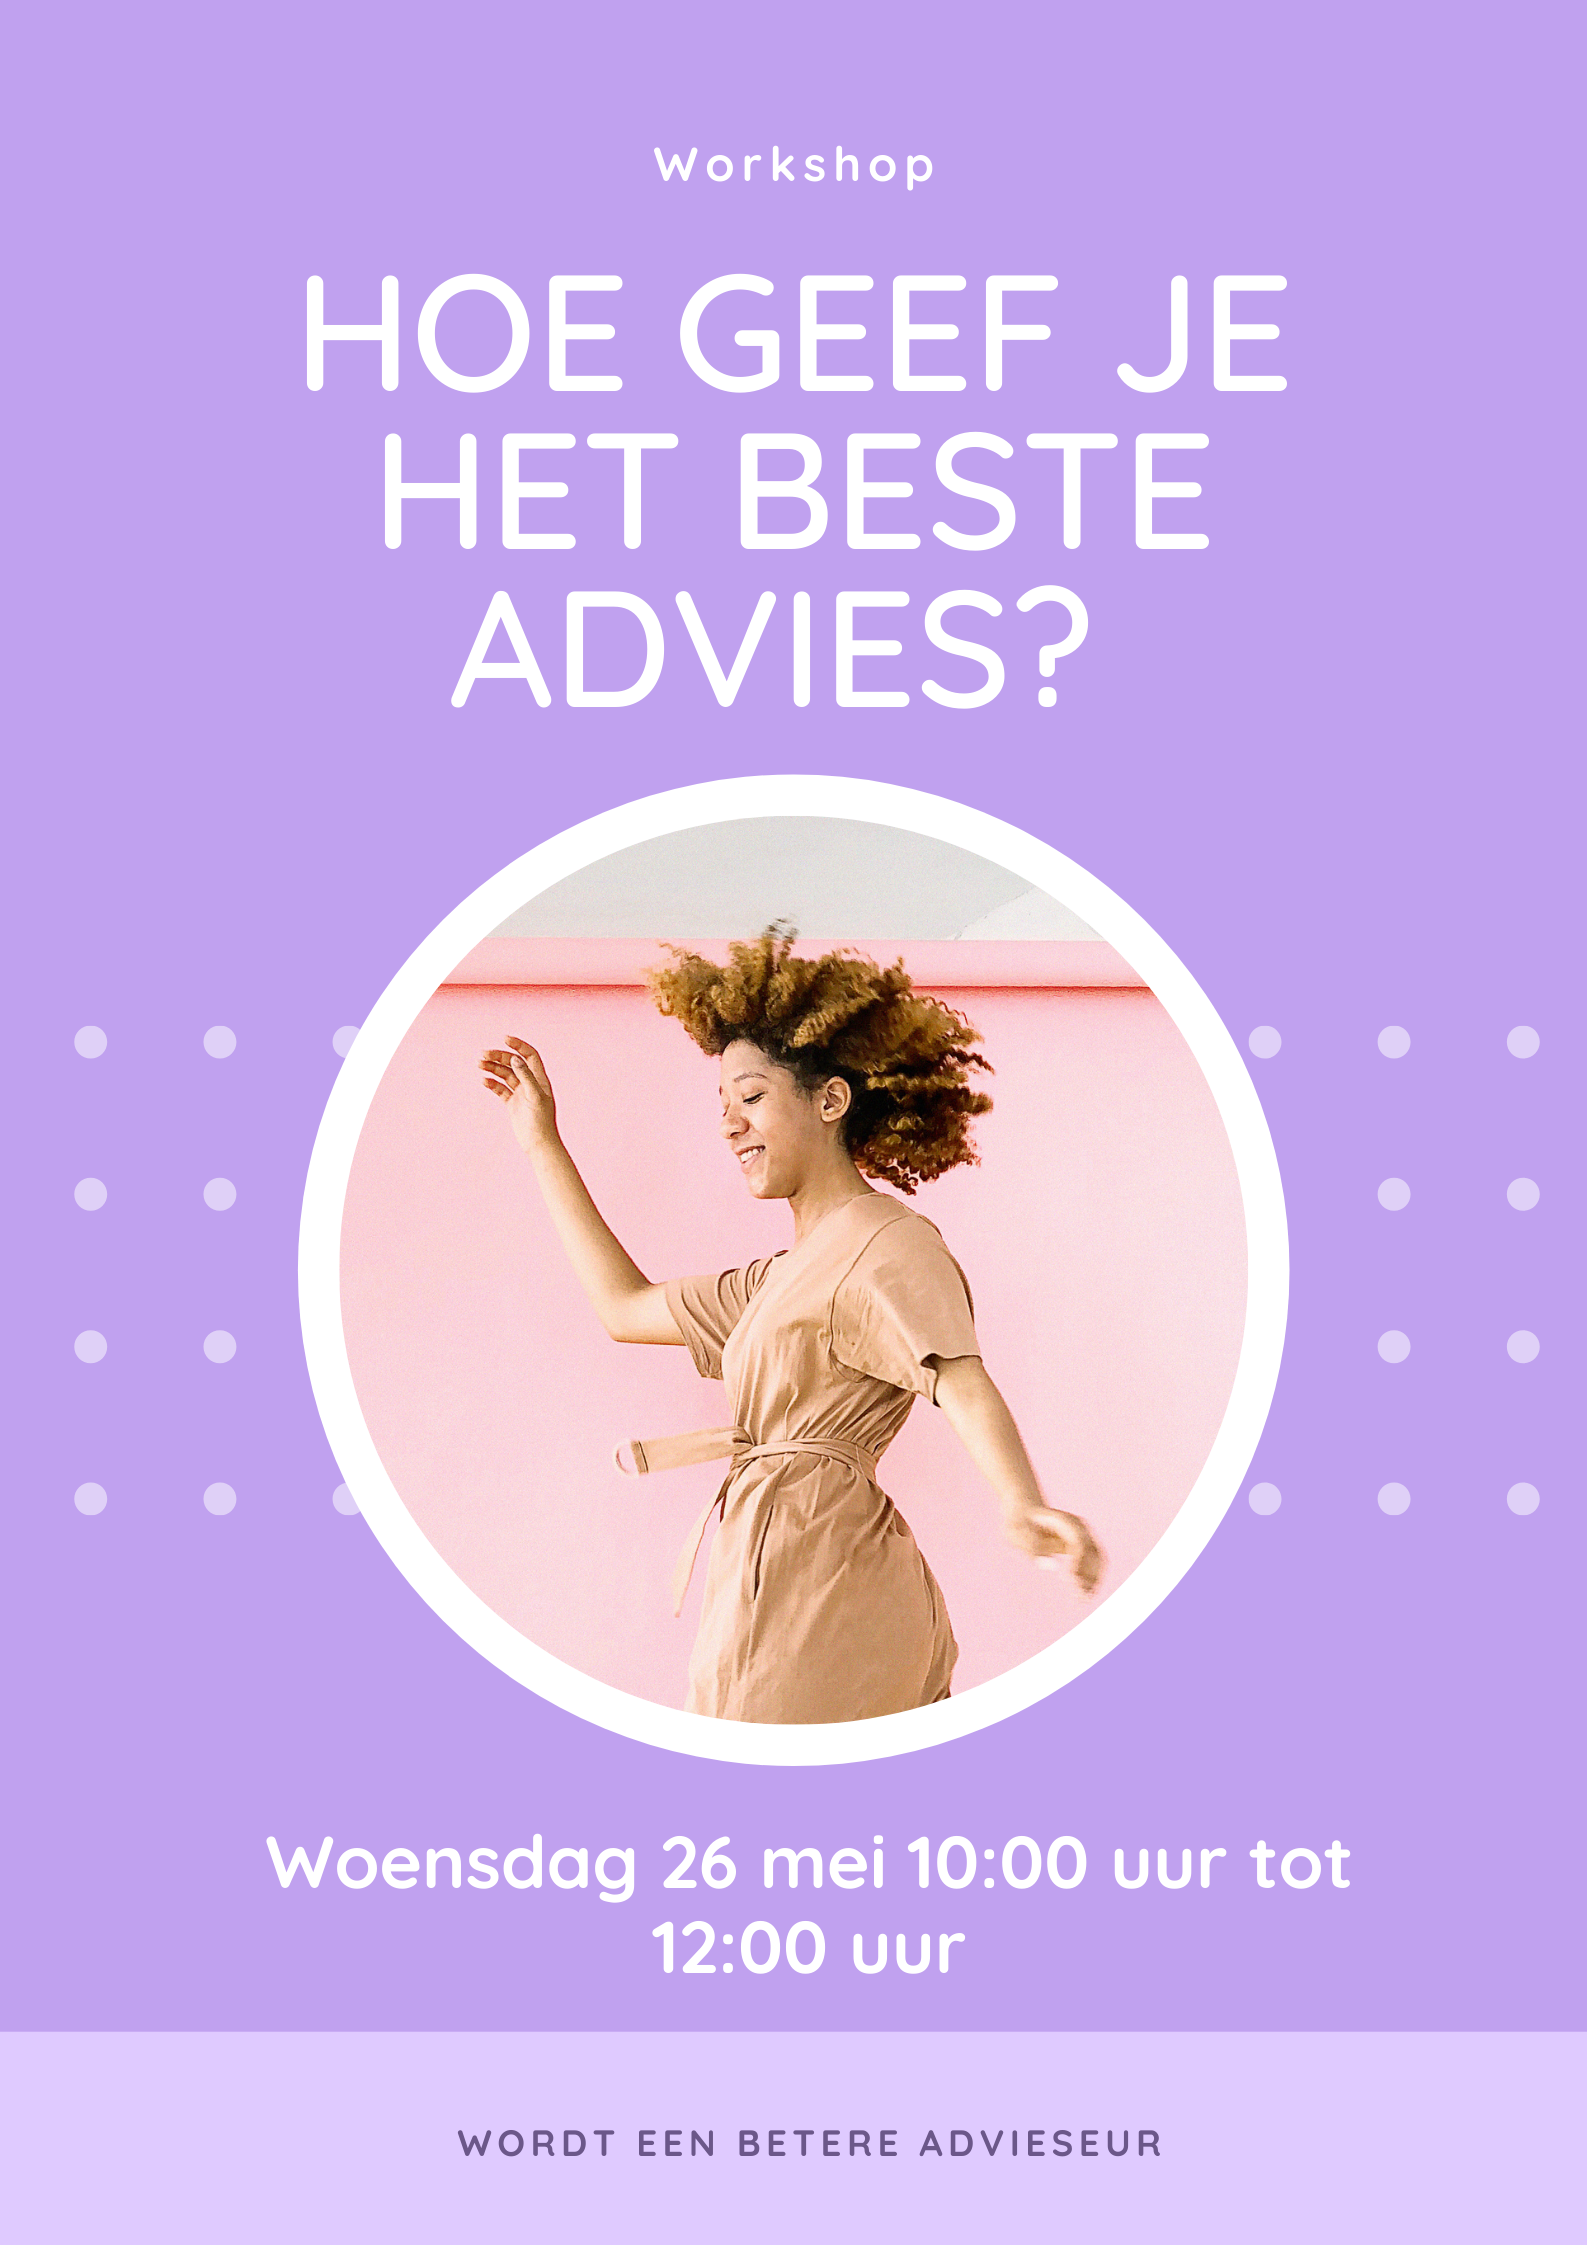 Hoe geef je het beste advies? Workshop